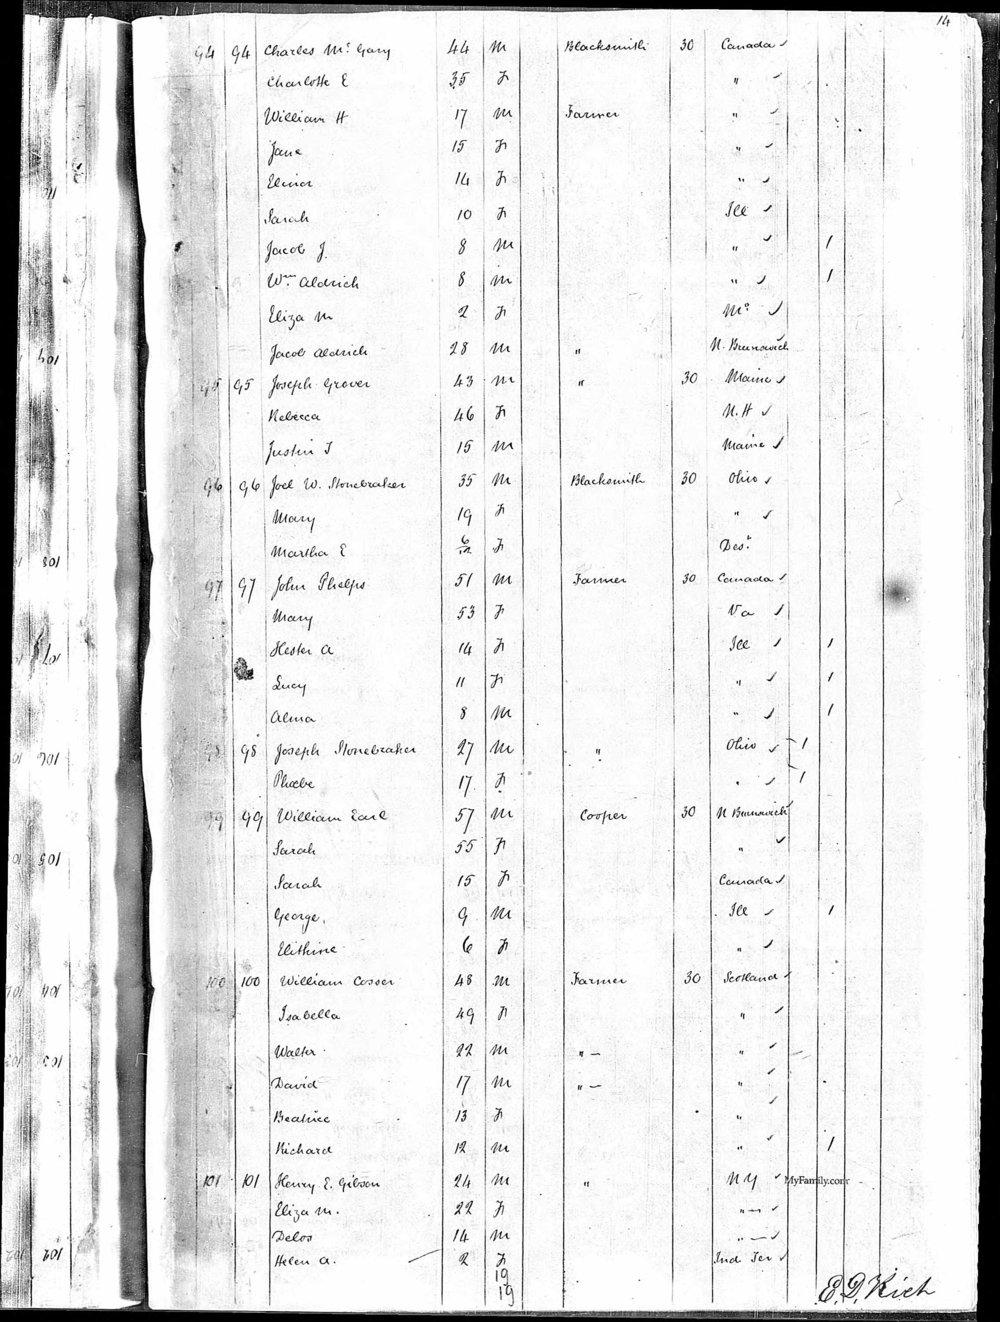 Stonebraker--1850 Joel--Weber-Utah Territory.jpg